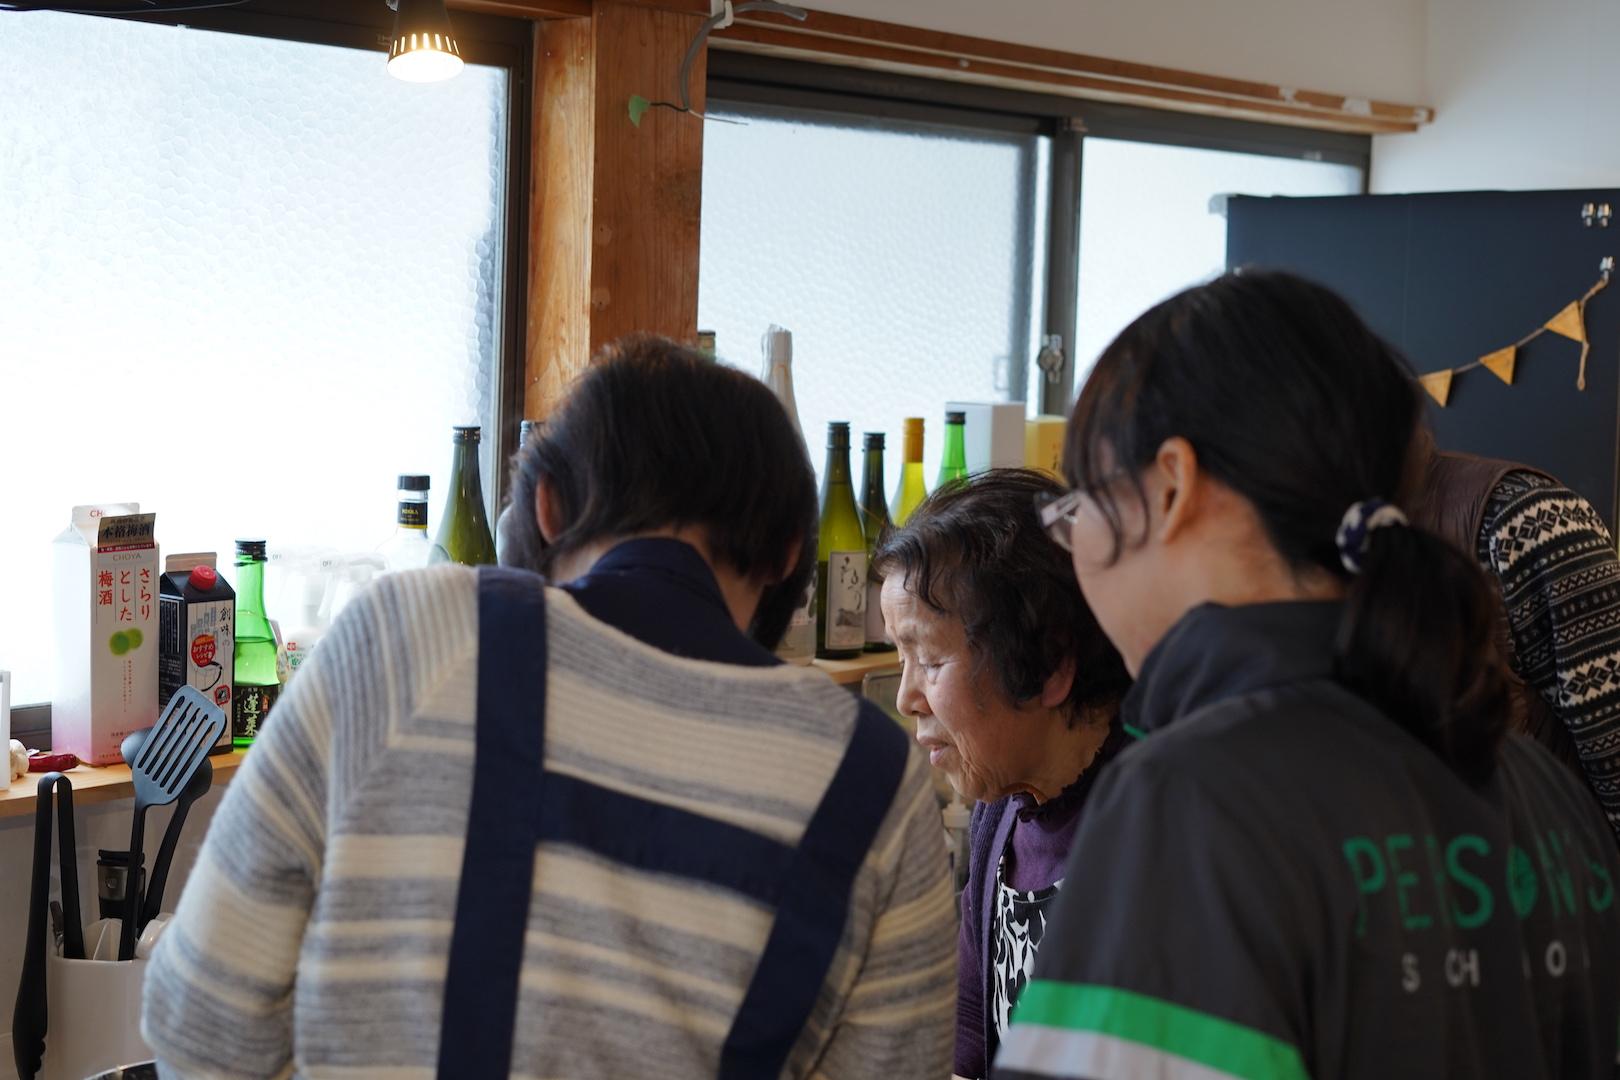 SHARE BASE 昭和村の体験プラン